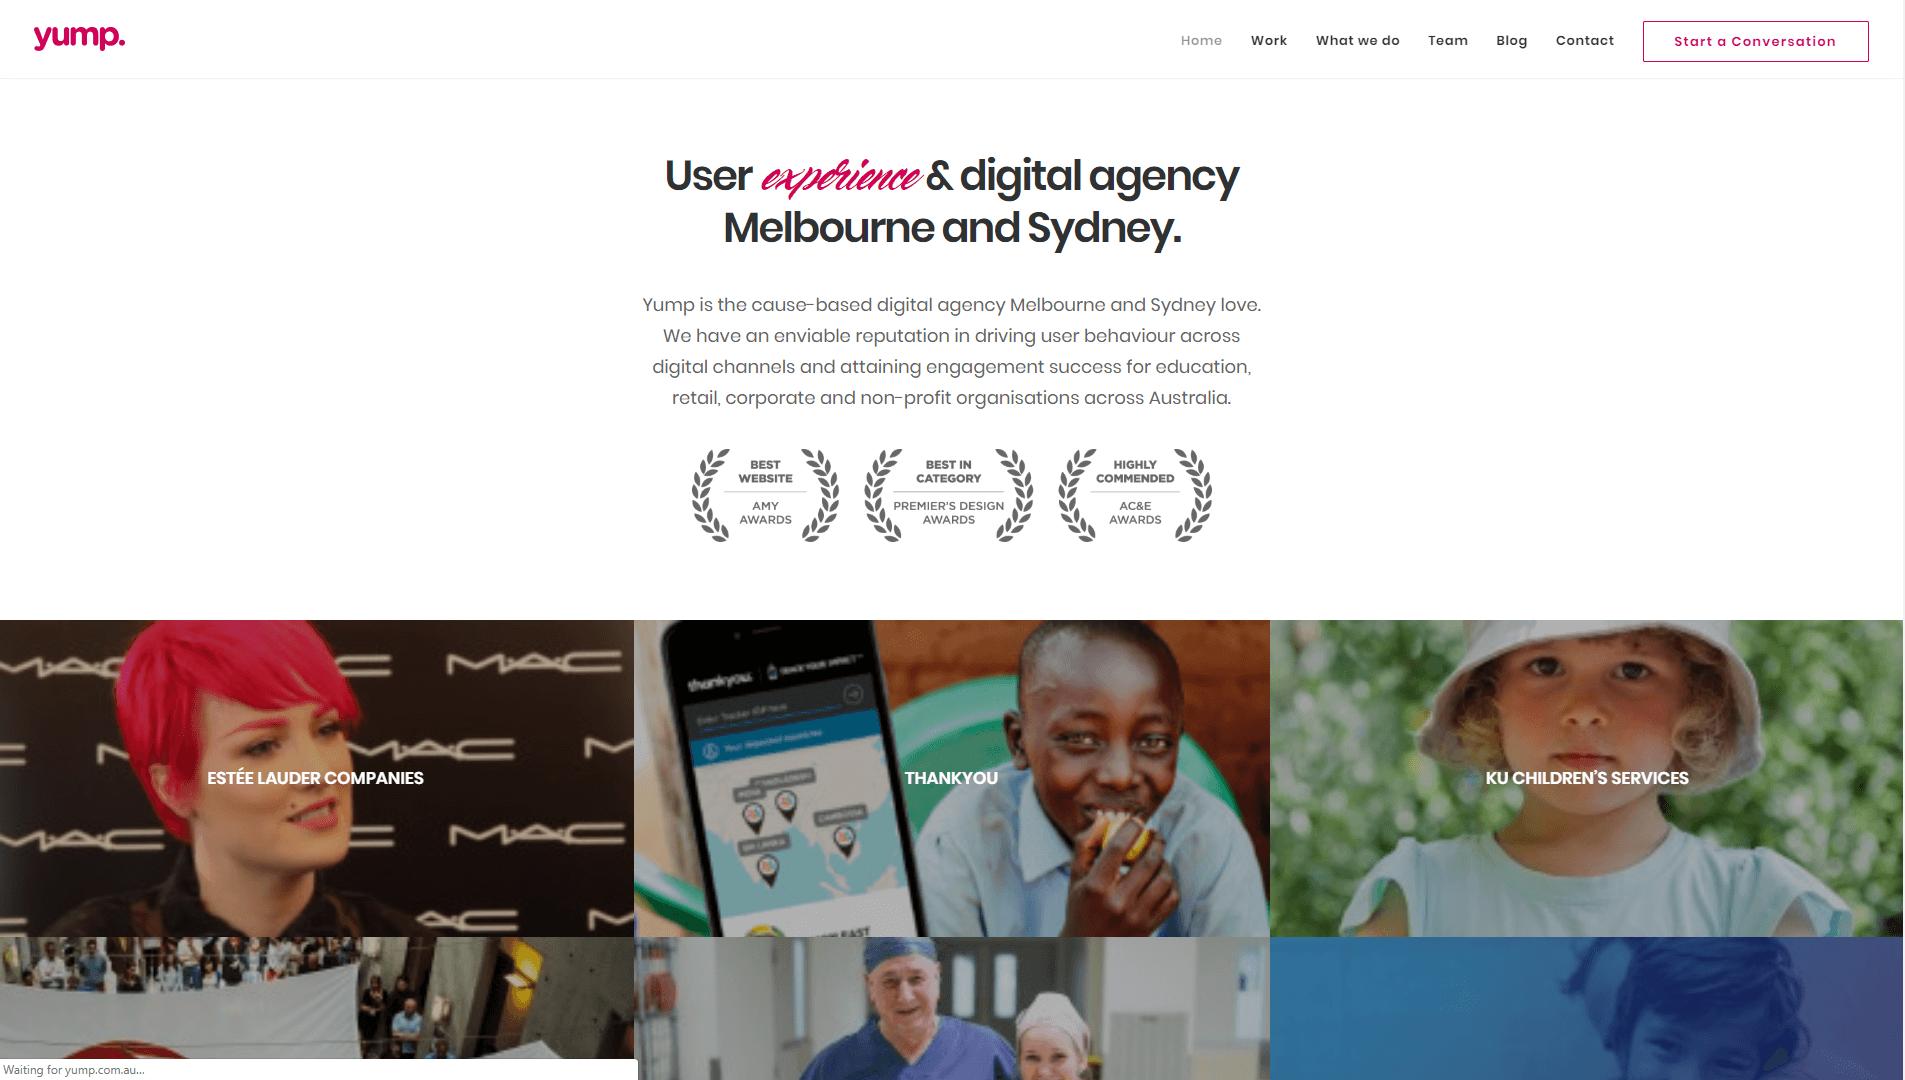 The Yump homepage.